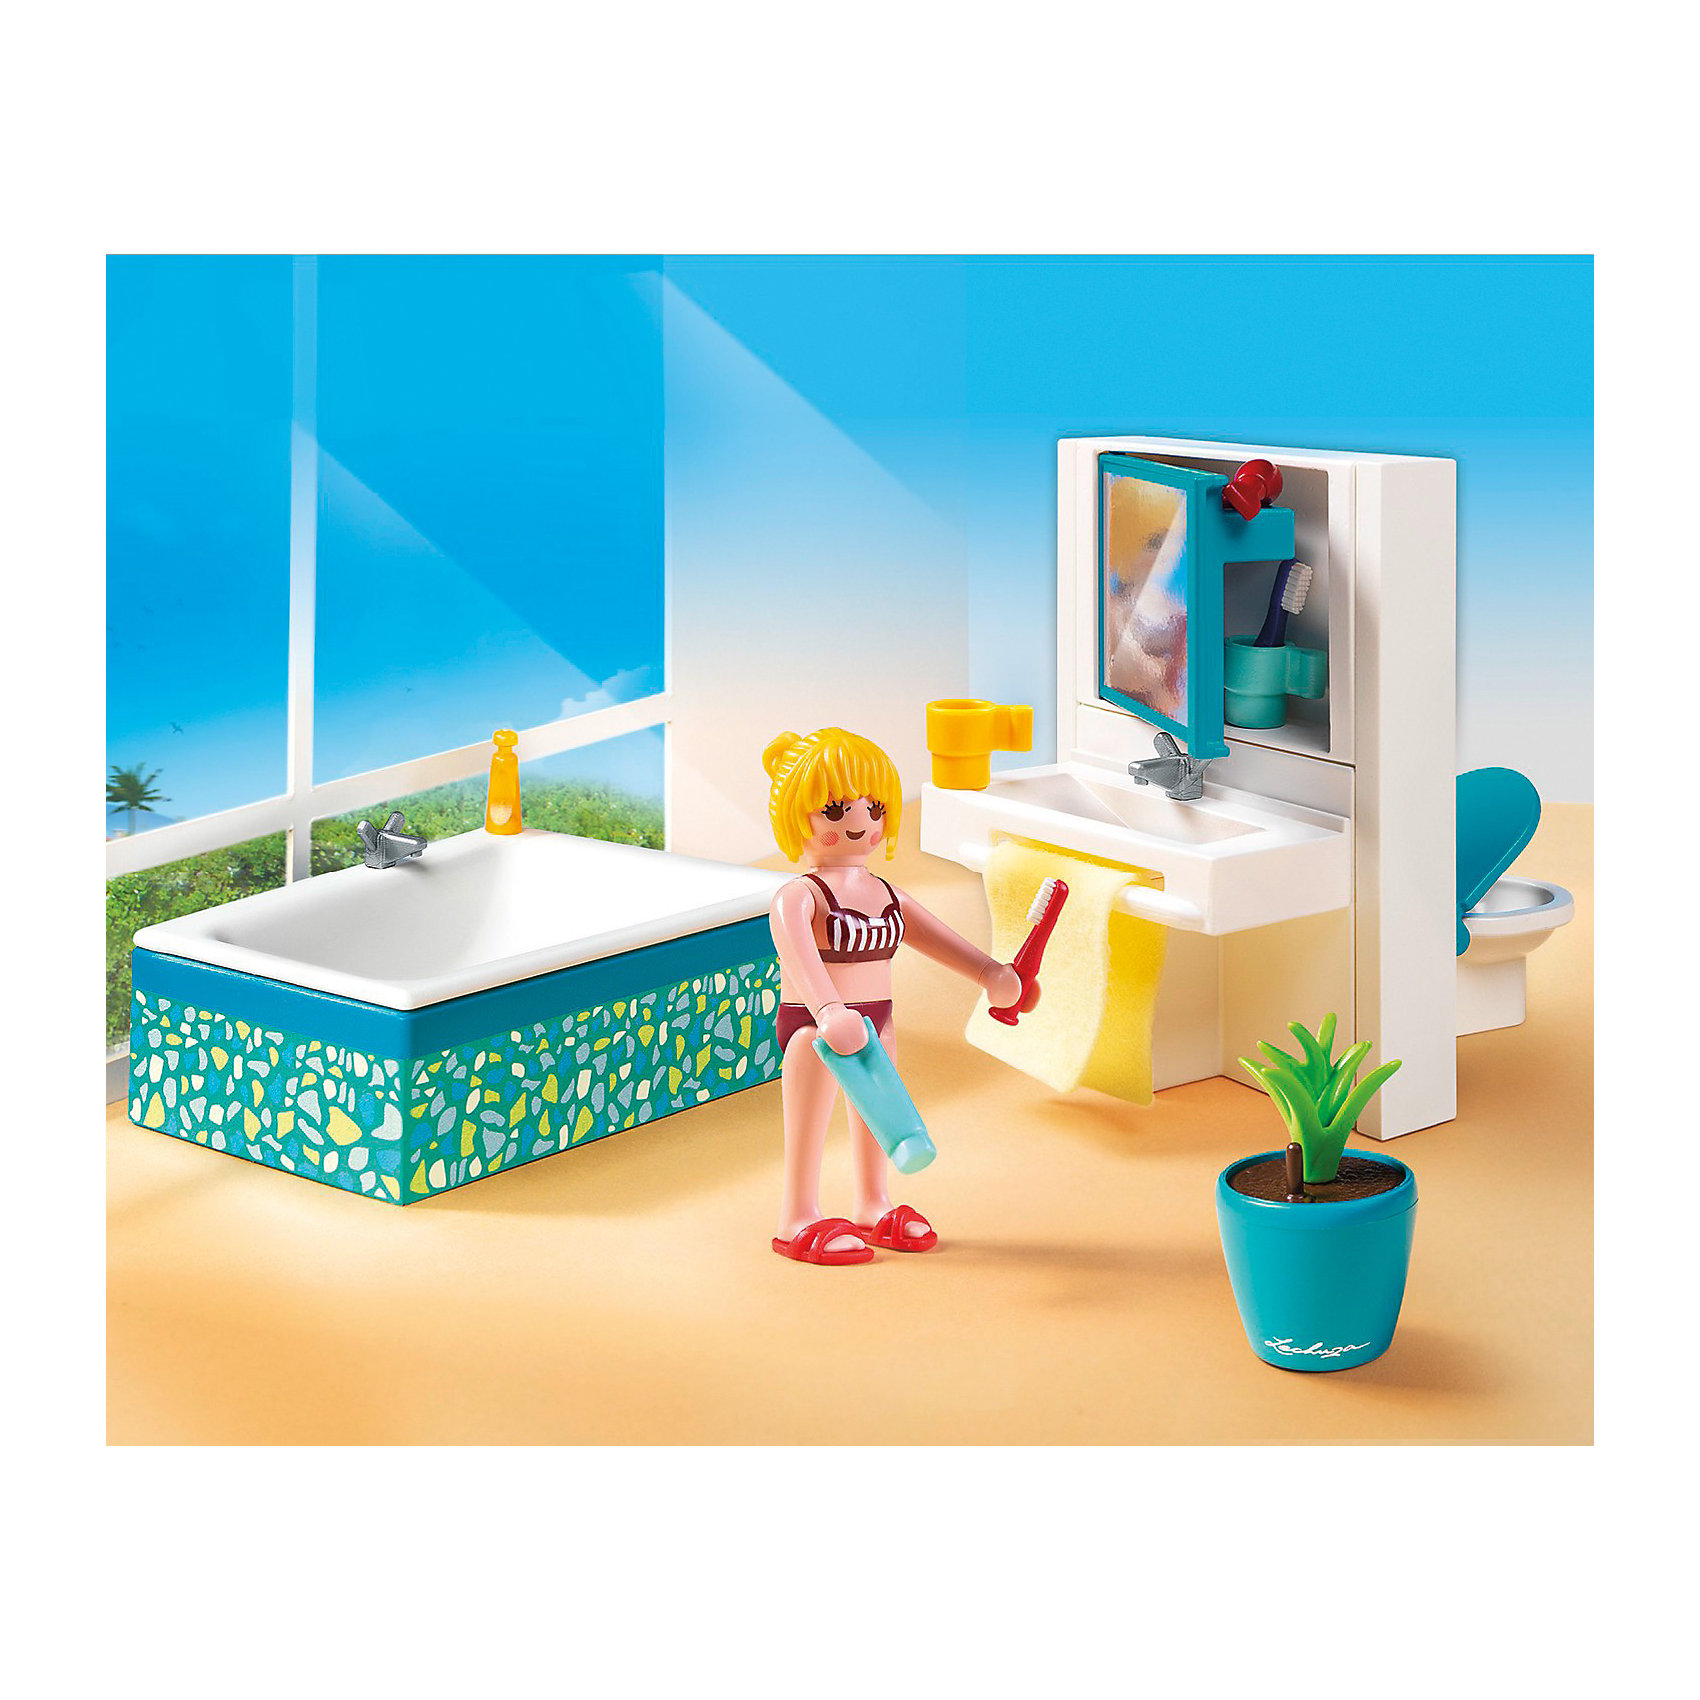 PLAYMOBIL® PLAYMOBIL 5577 Особняки: Современная ванная комната